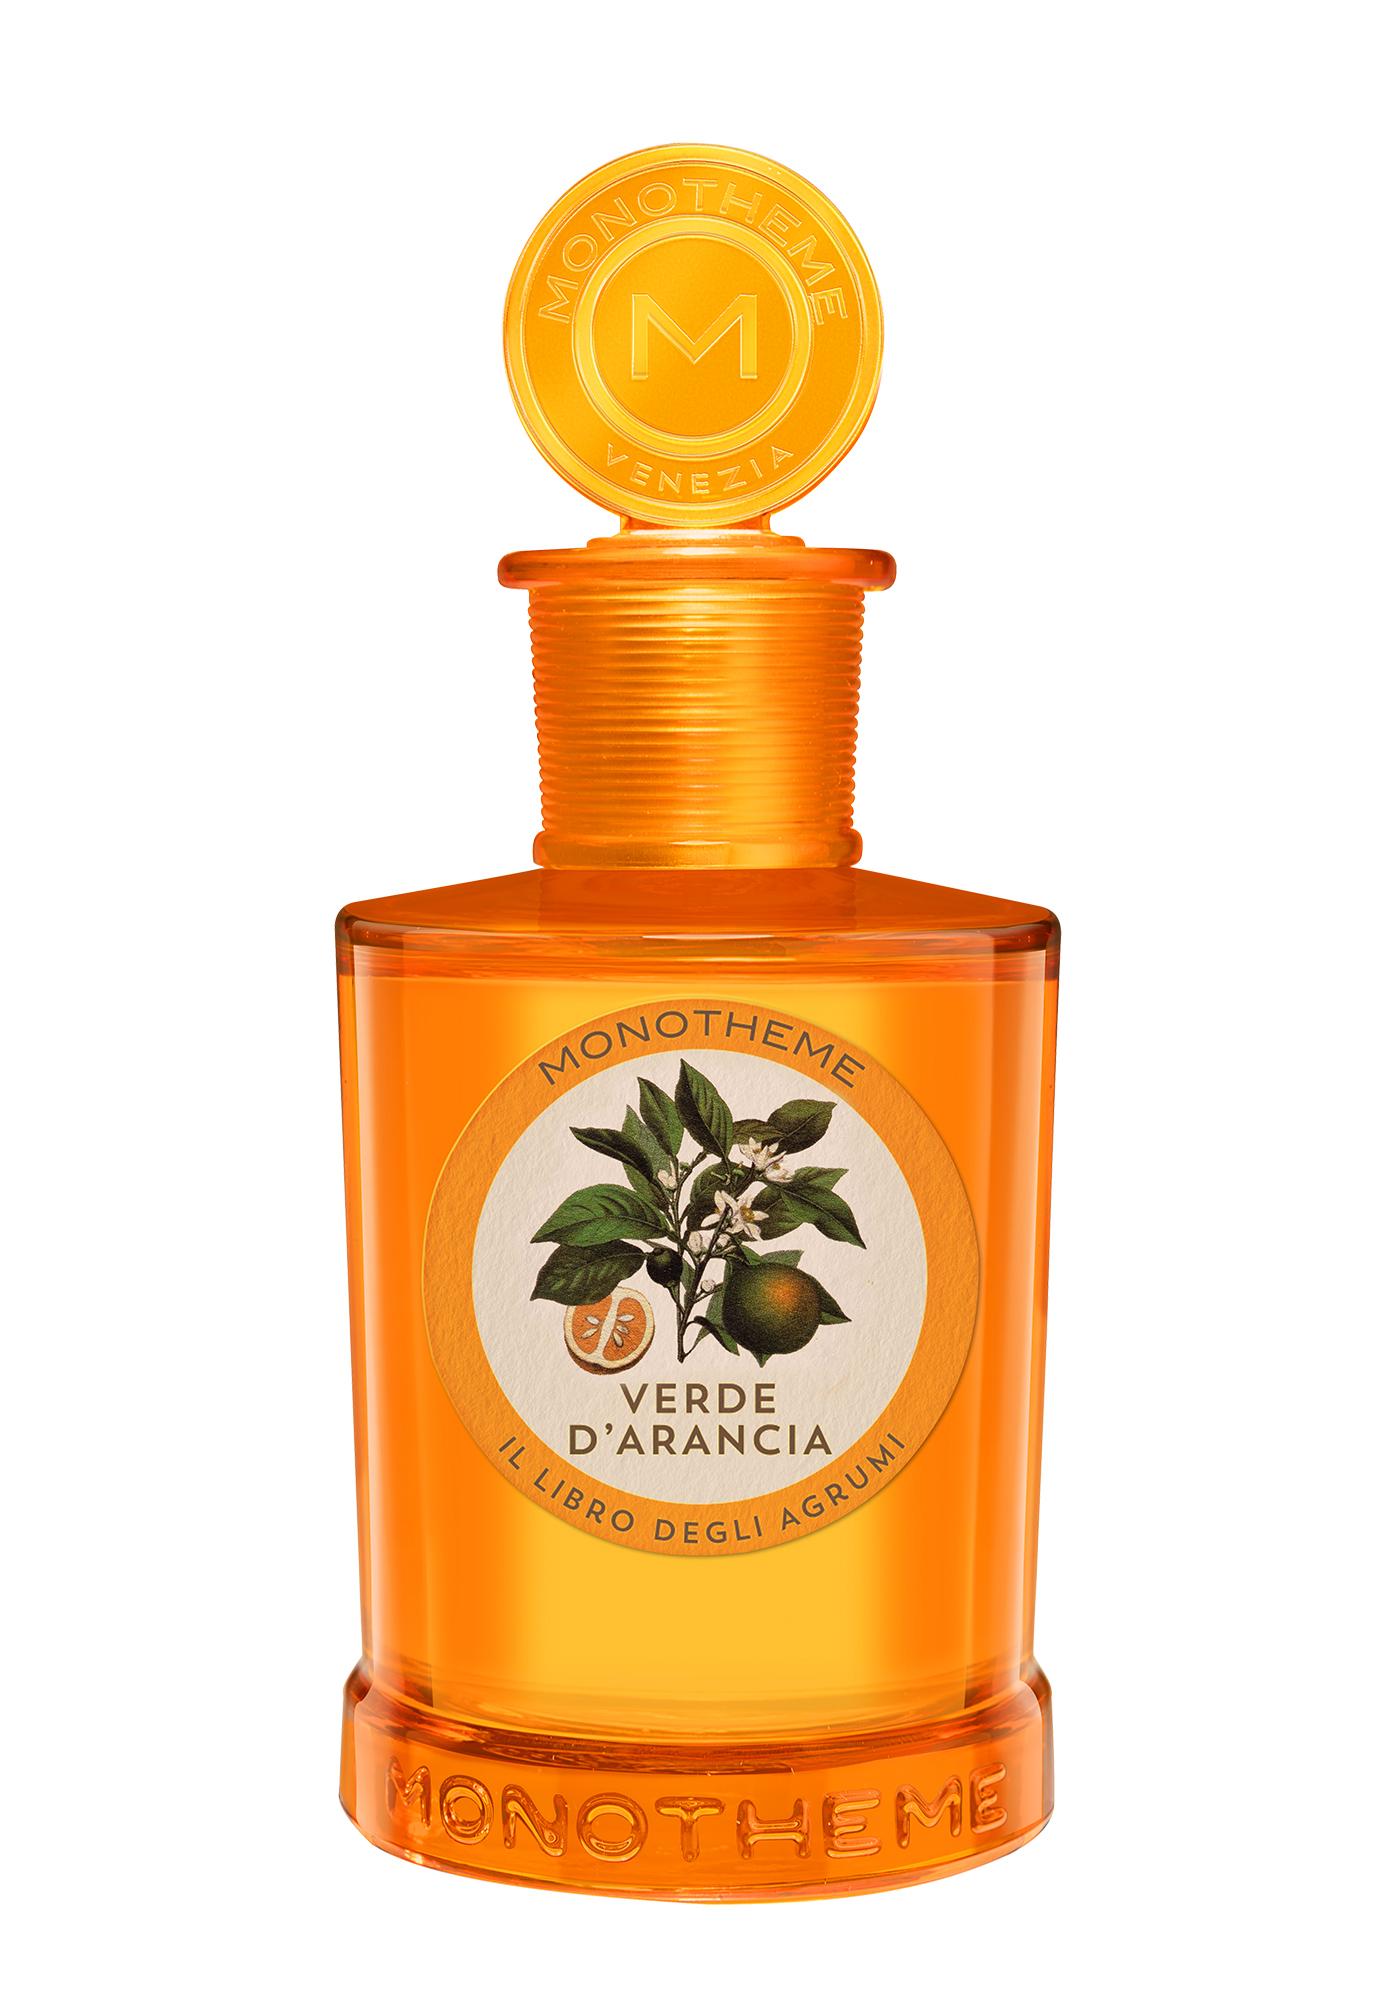 Verde d'Arancia Monotheme Fine Fragrances Venezia für Frauen